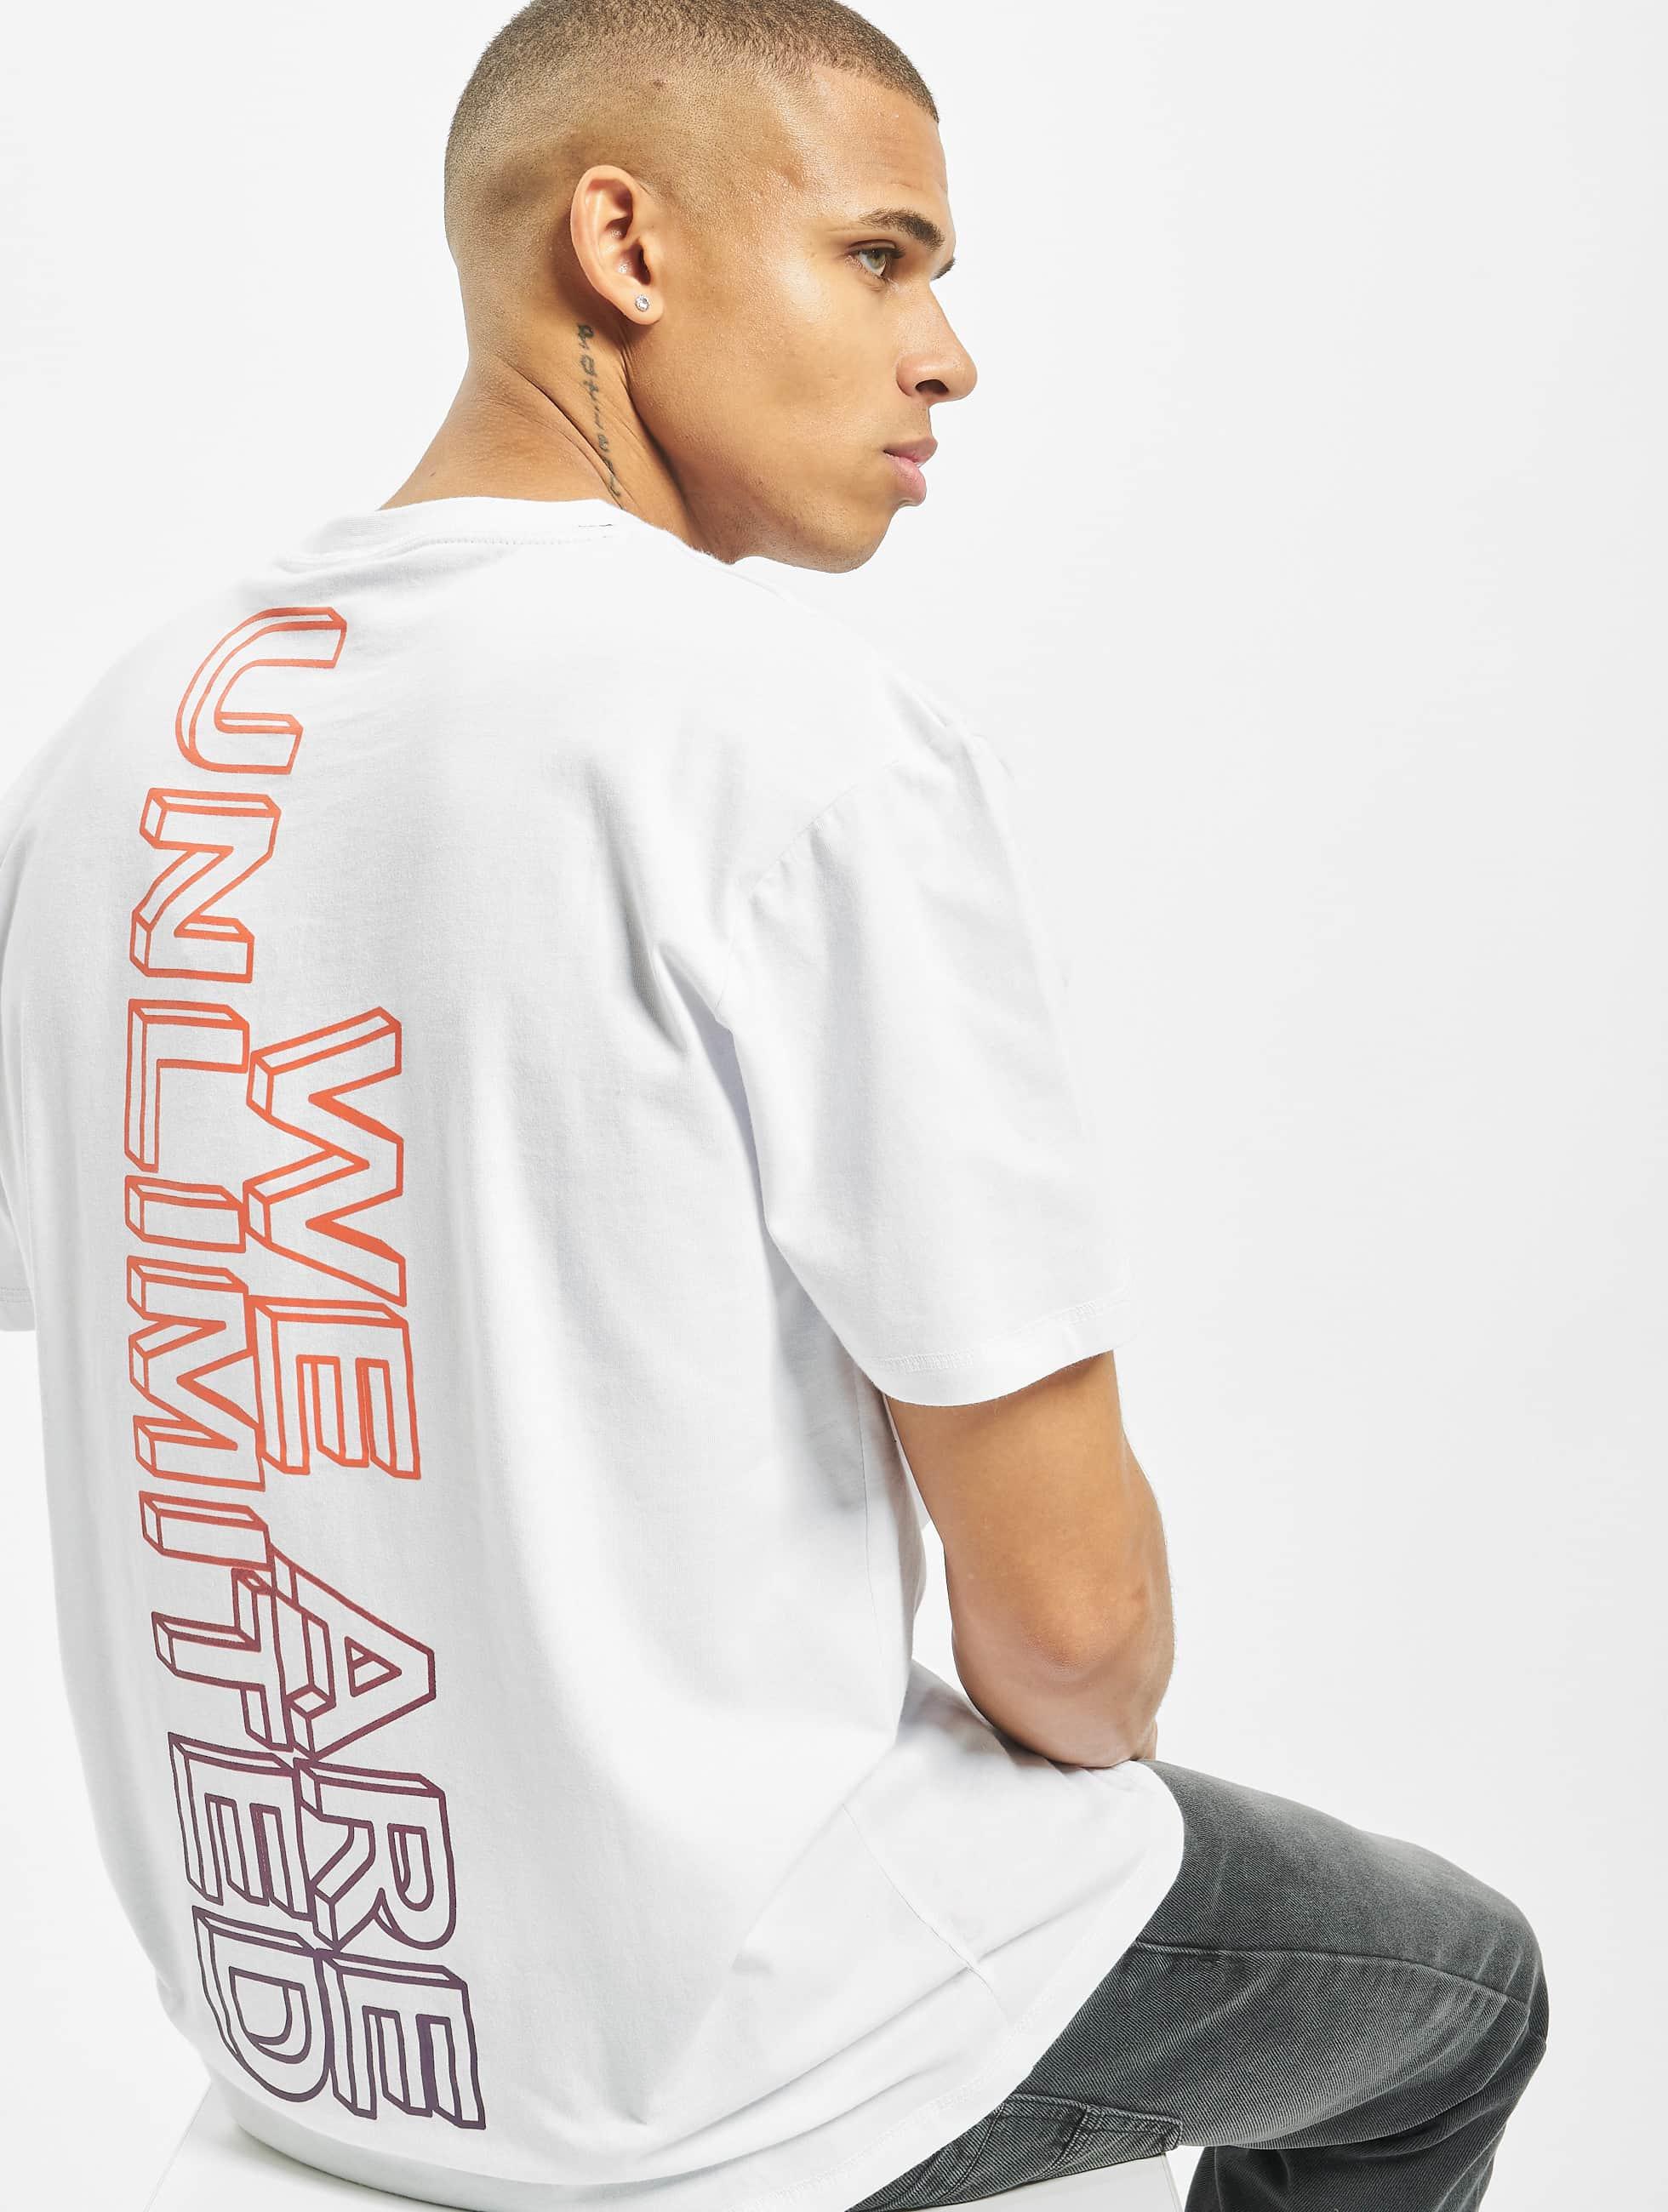 Ecko Unltd. / T-Shirt Luray in white S